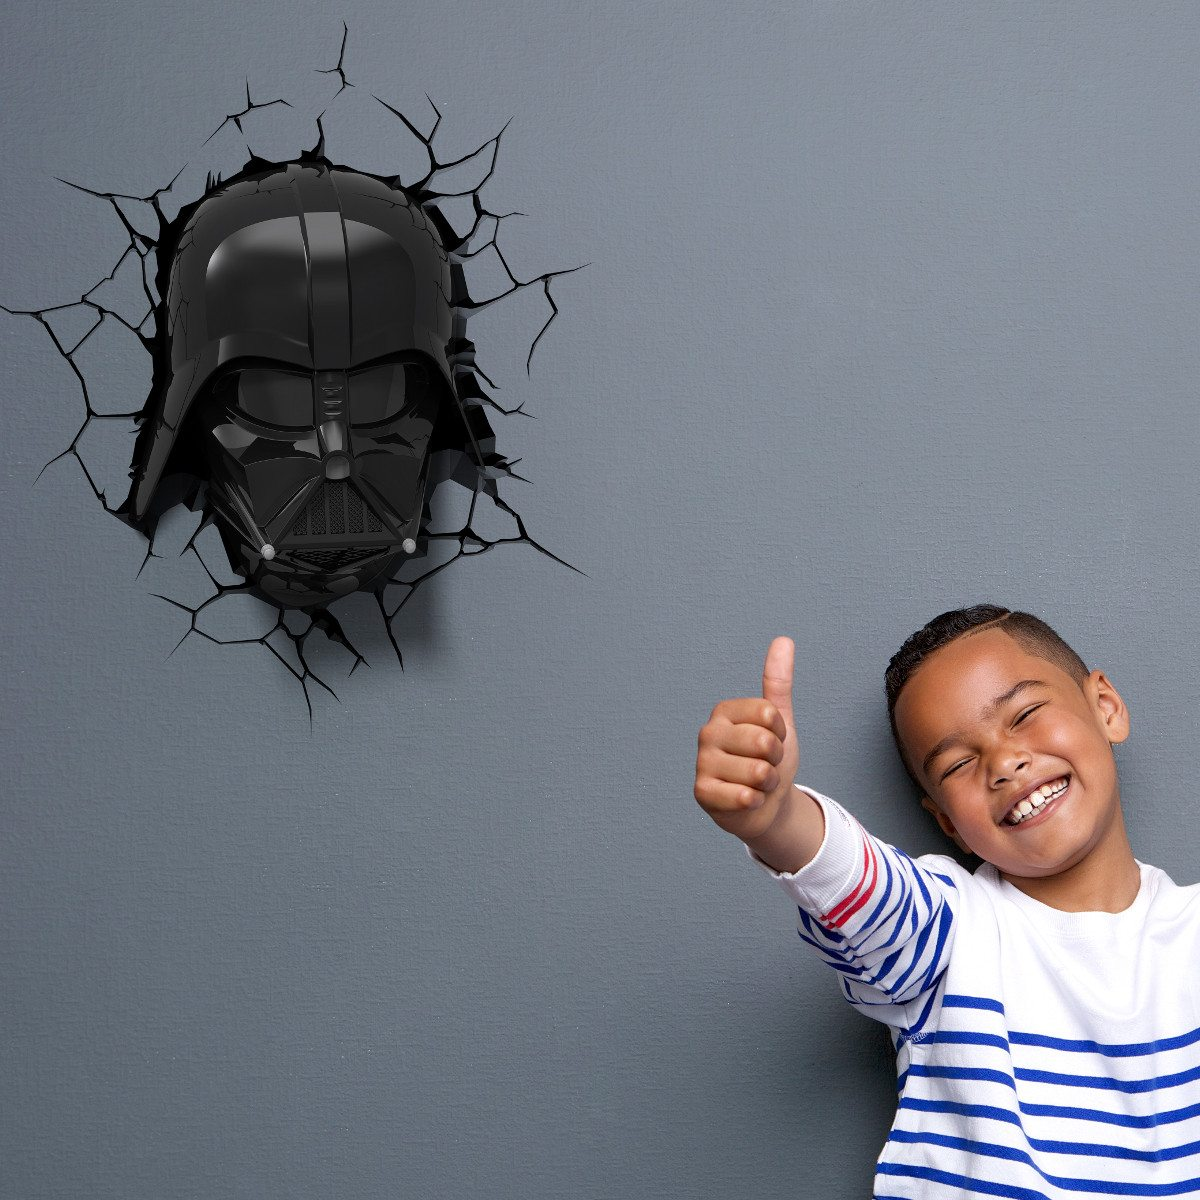 3D-Licht: Darth Vader